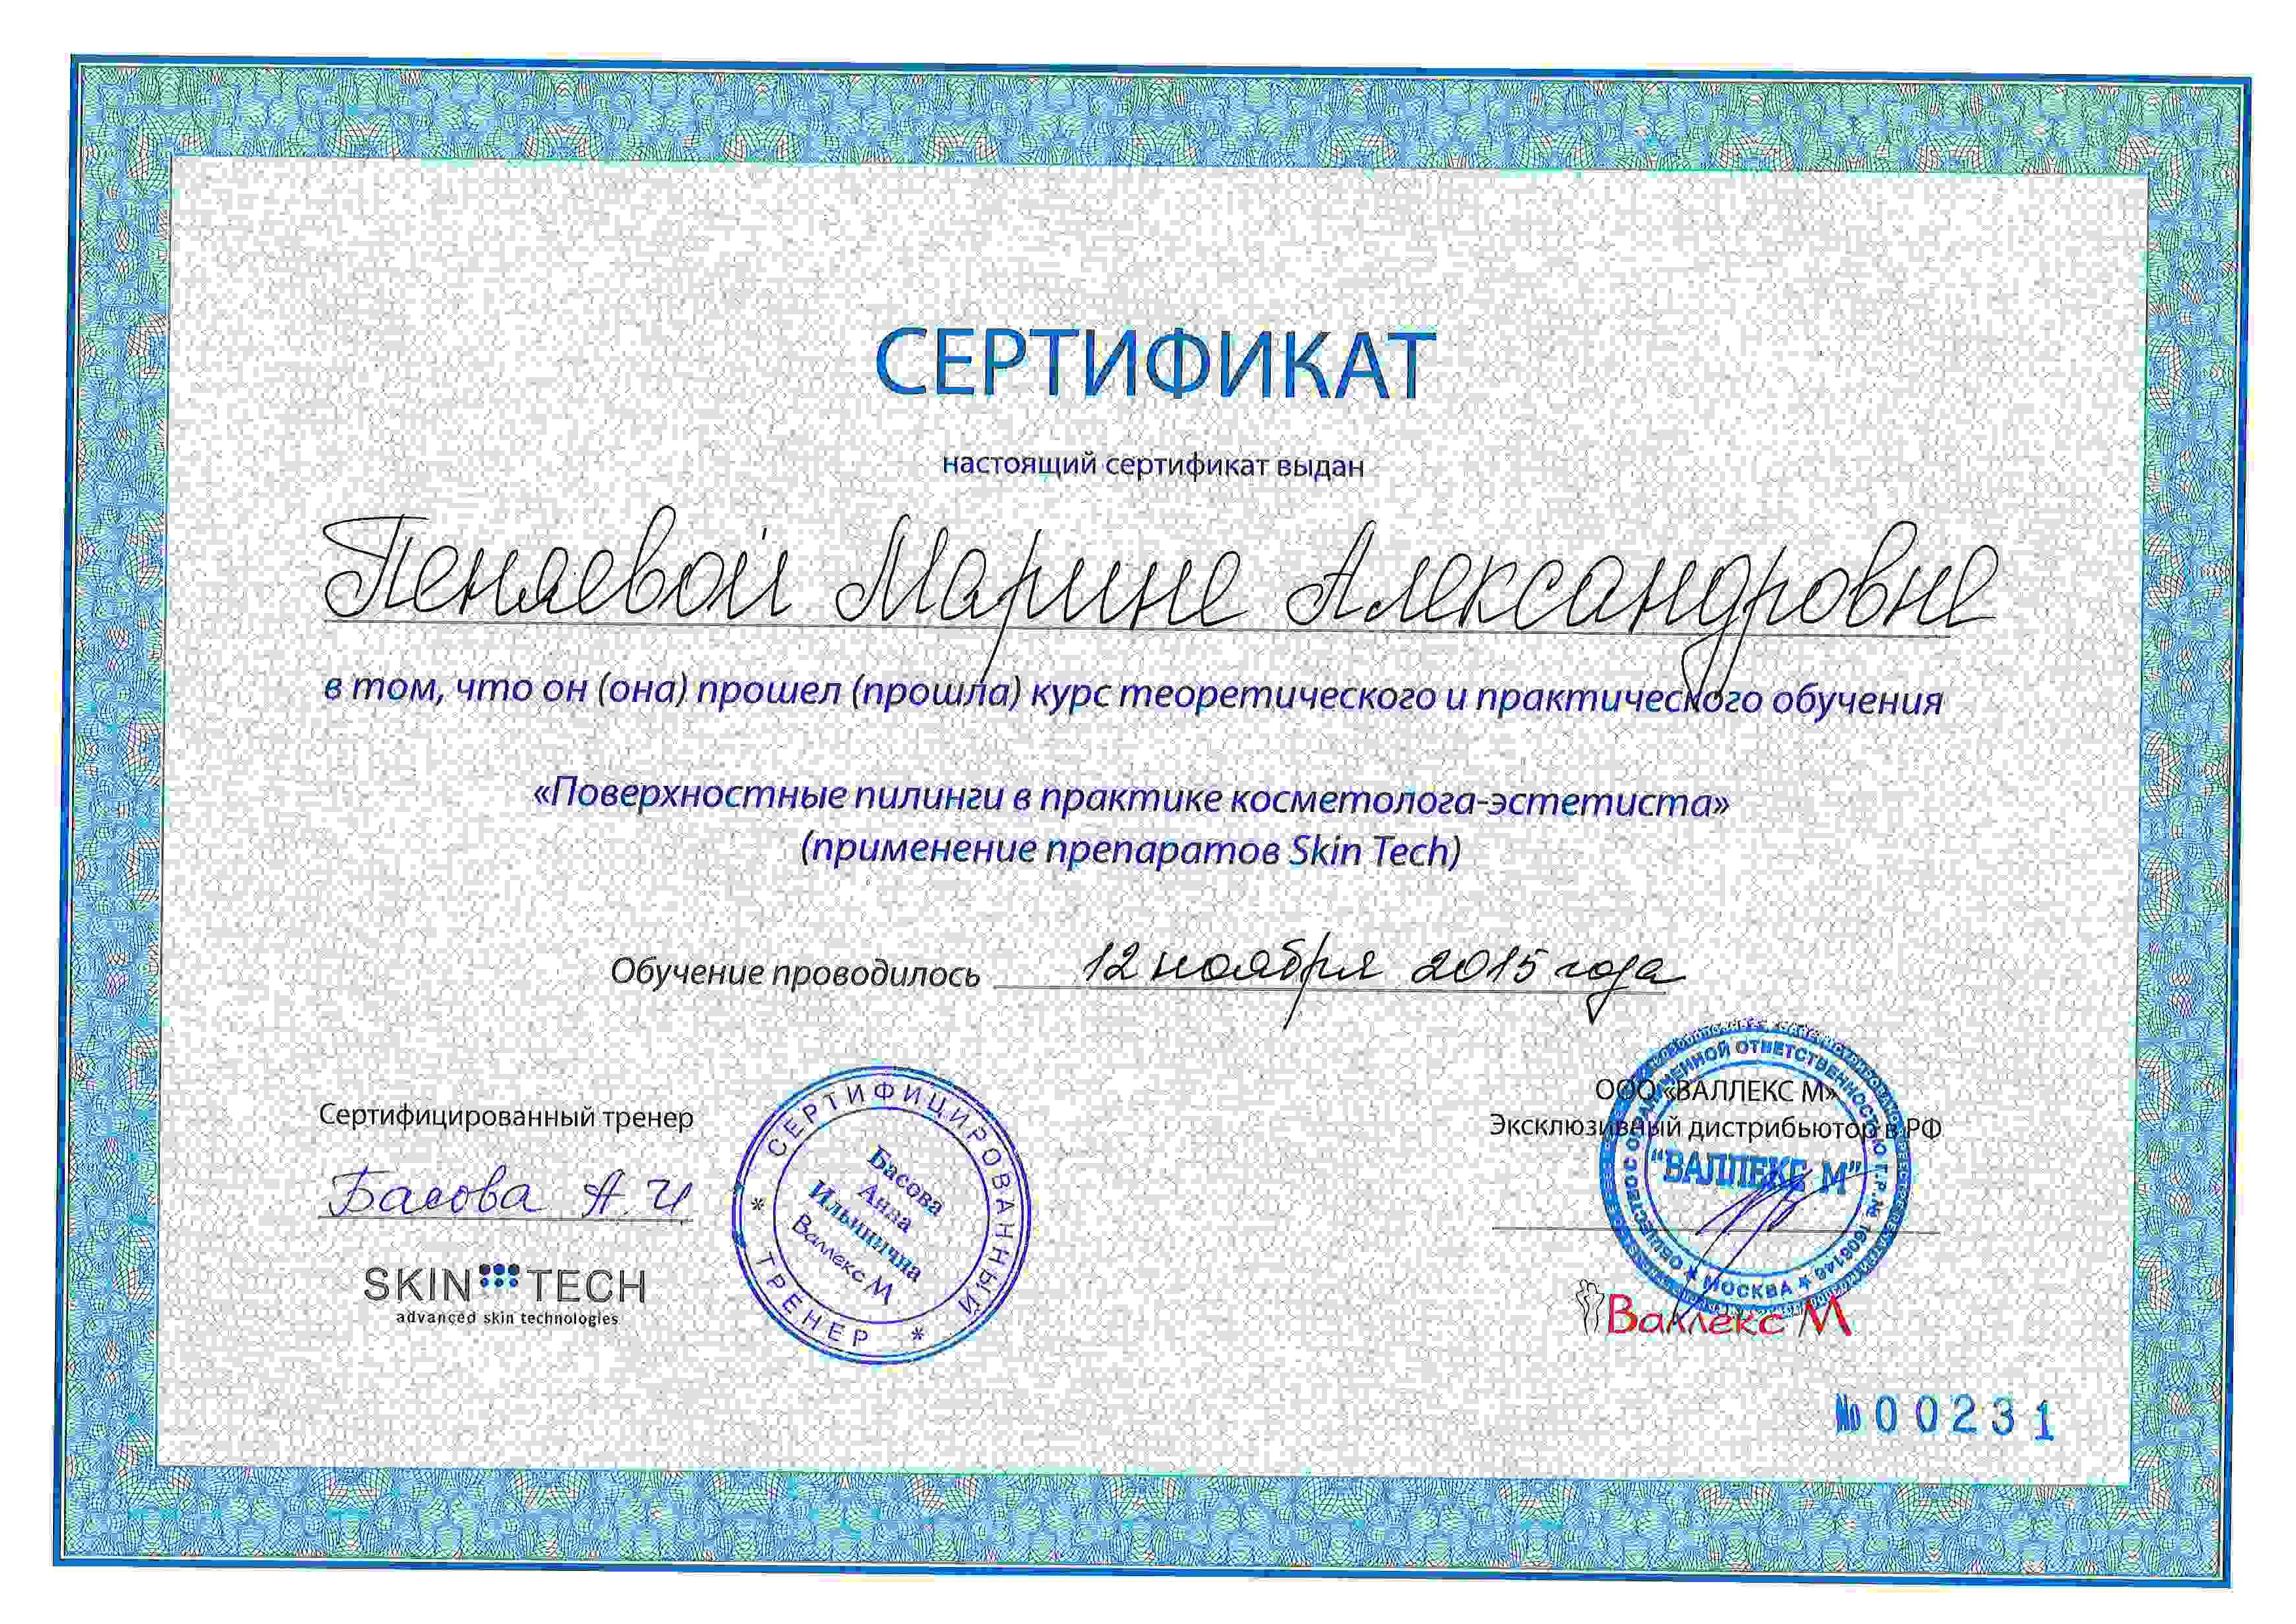 Сертификат Пеняева 1